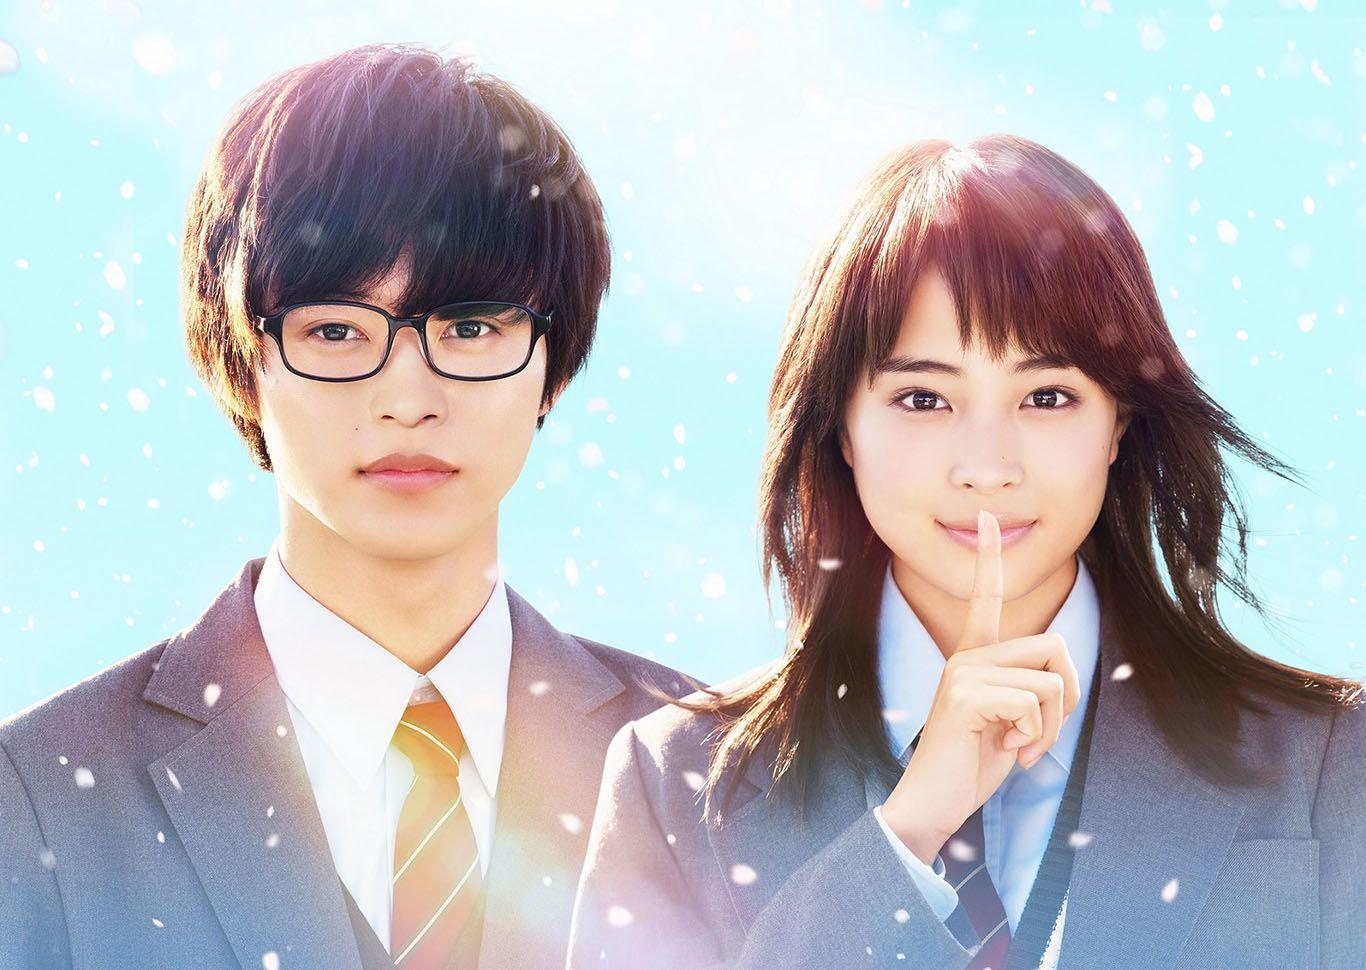 7 Daftar Film Jepang Romantis